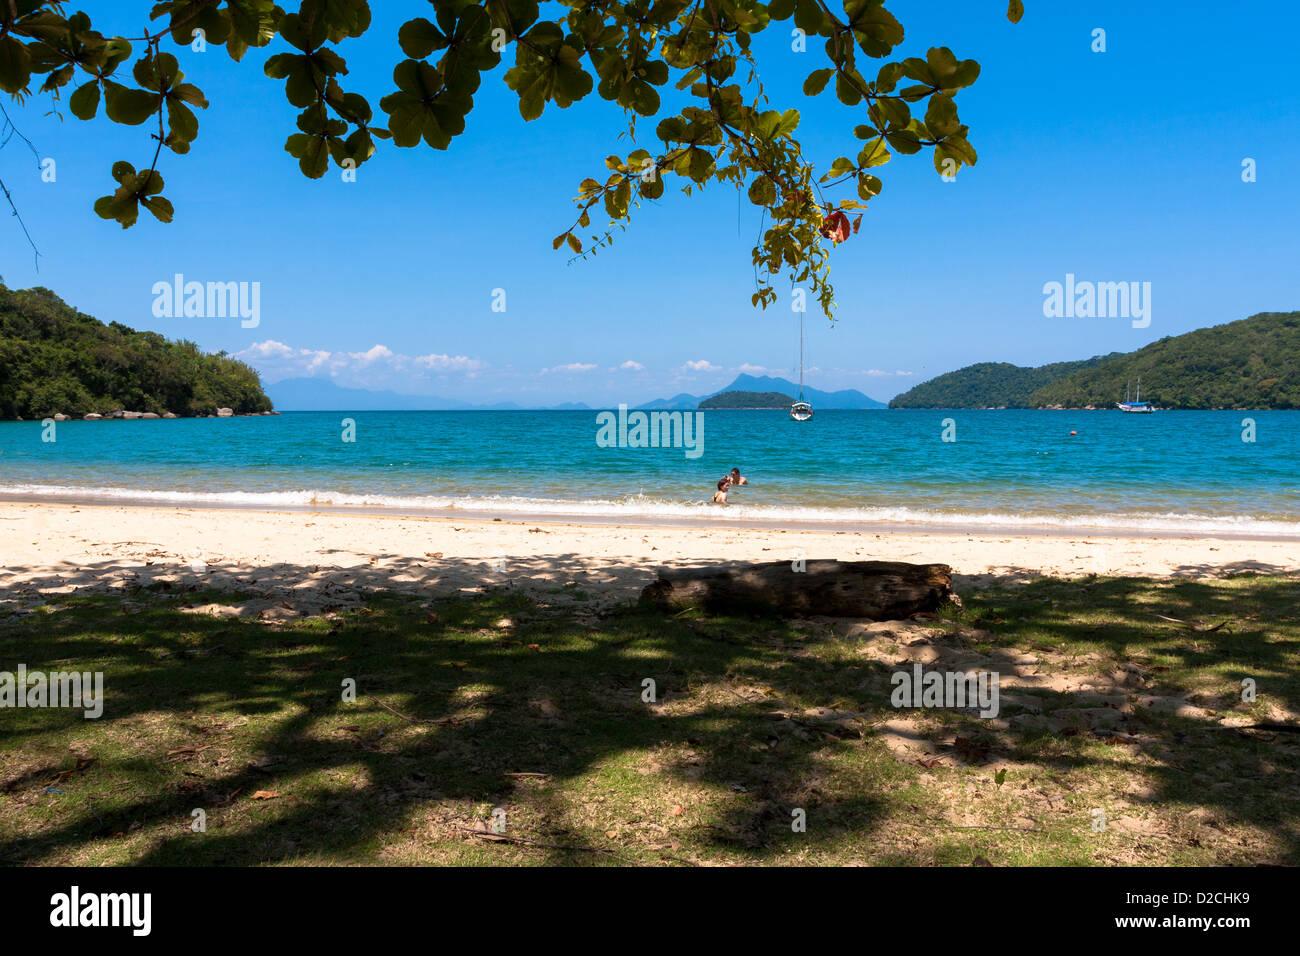 Lopes Mendes beach, Ilha Grande Angra dos Reis, Stato di Rio de Janeiro, Brasile Immagini Stock